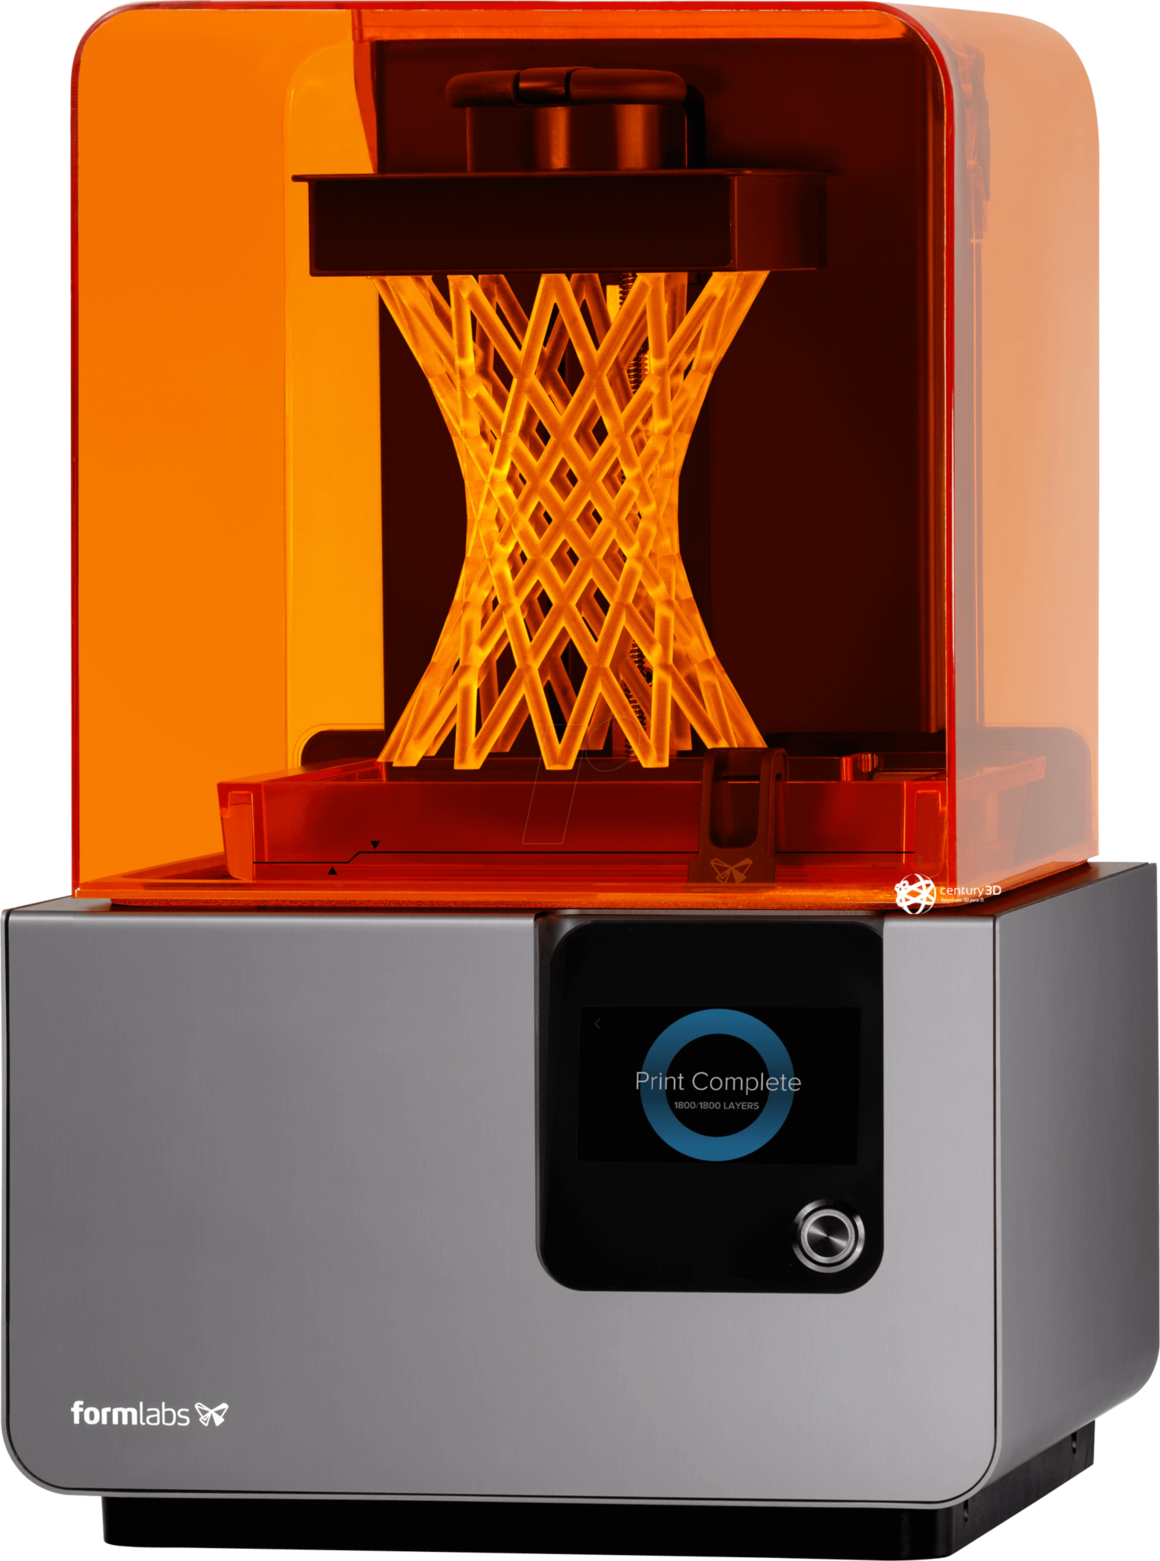 Impresoras 3D.